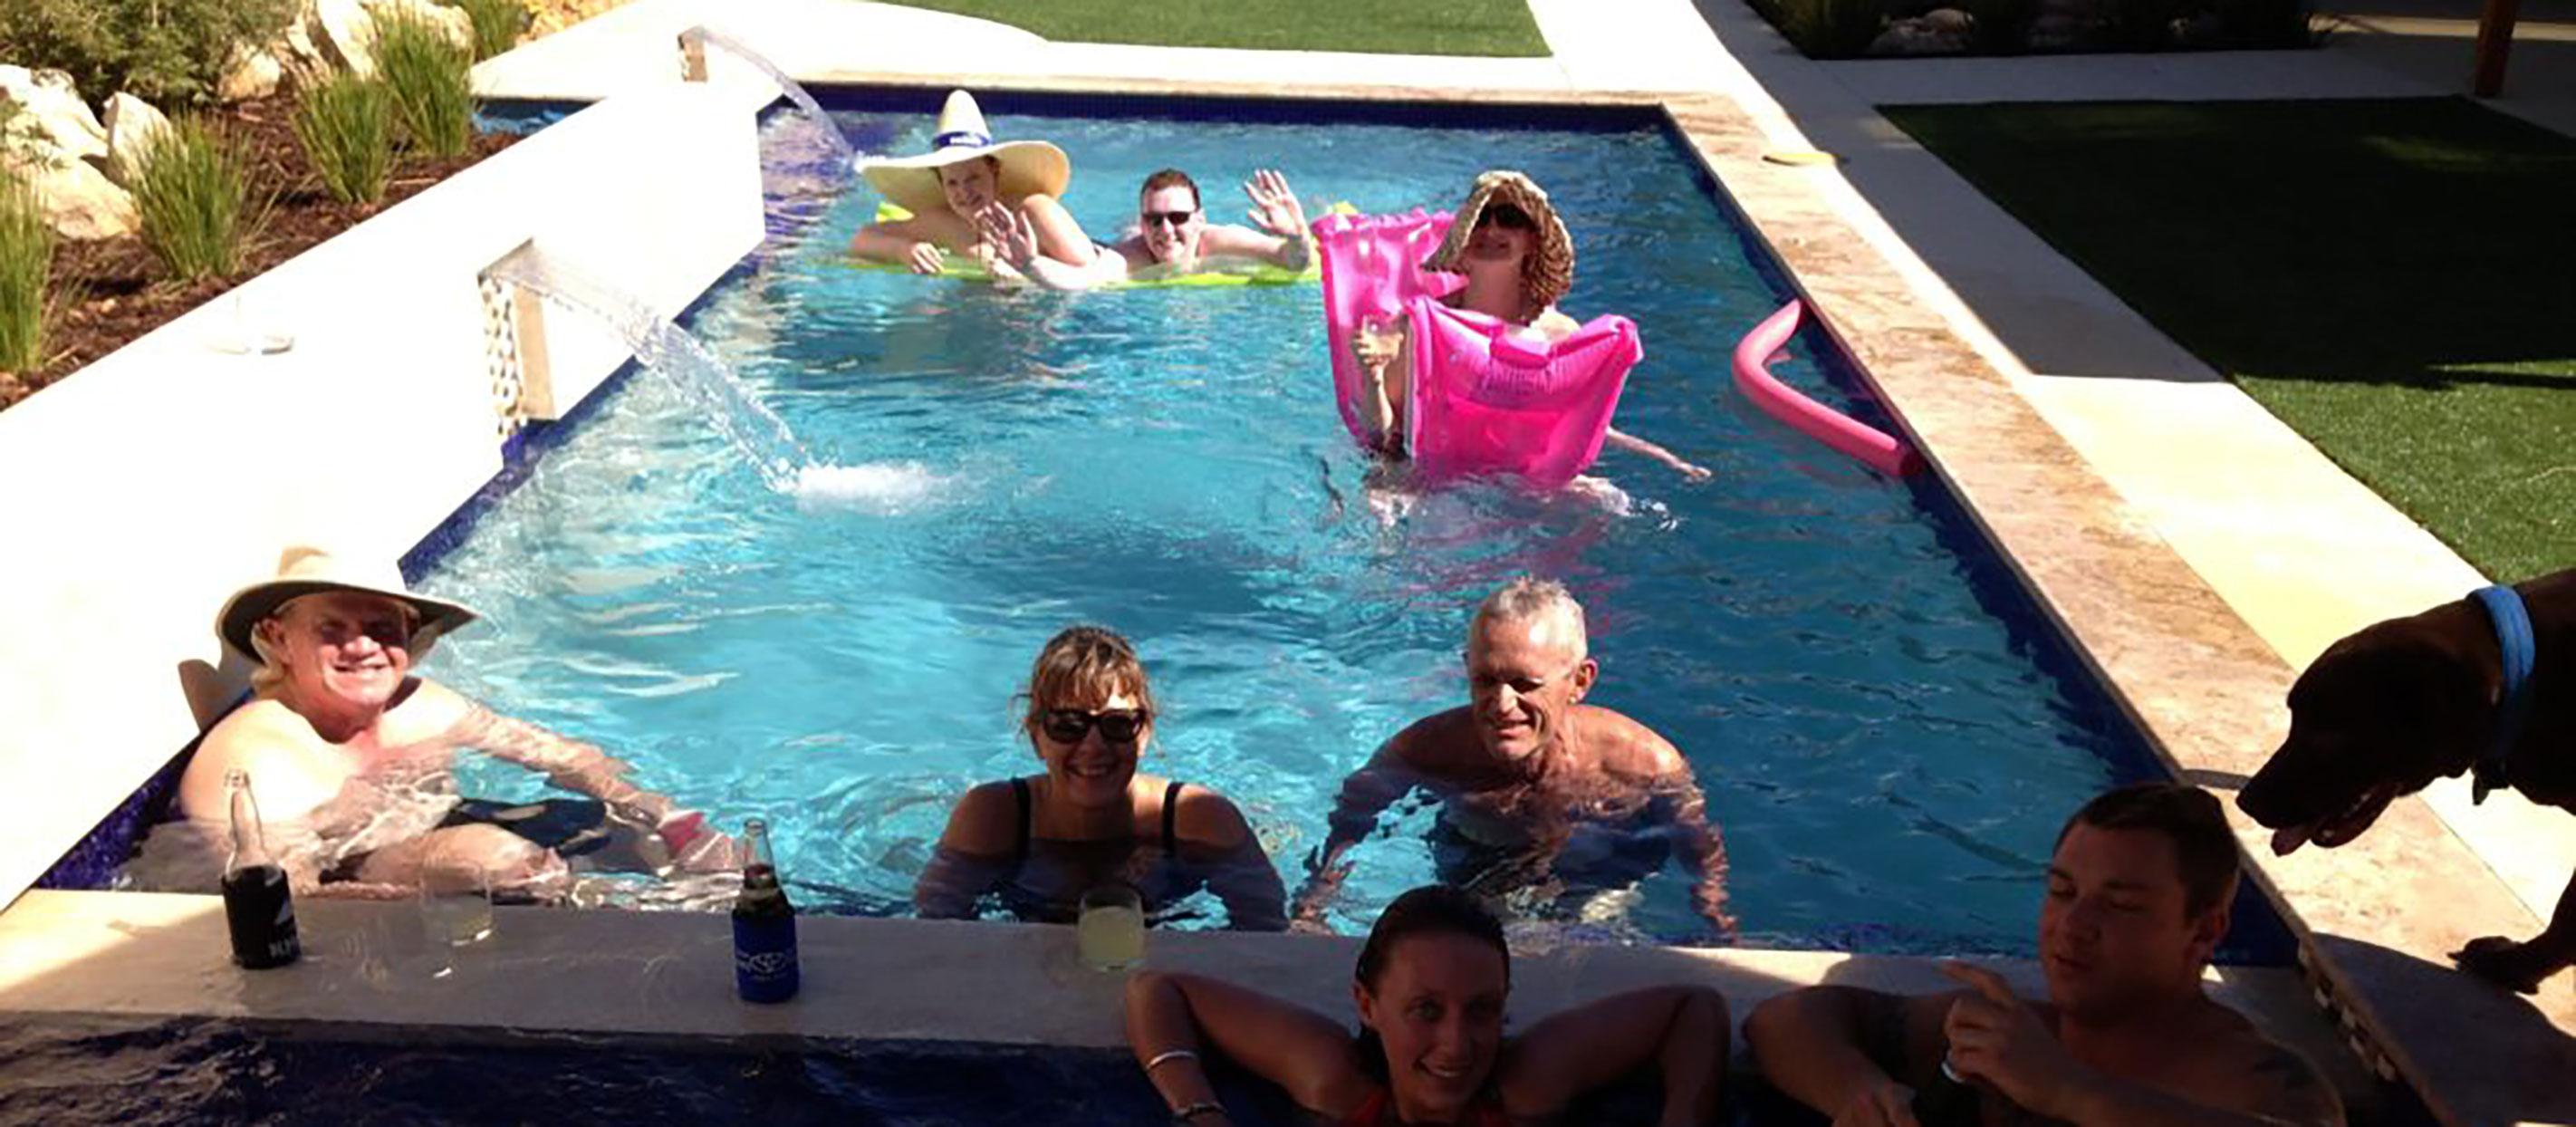 Pool resurfacing, renovations, restorations and coatings Perth